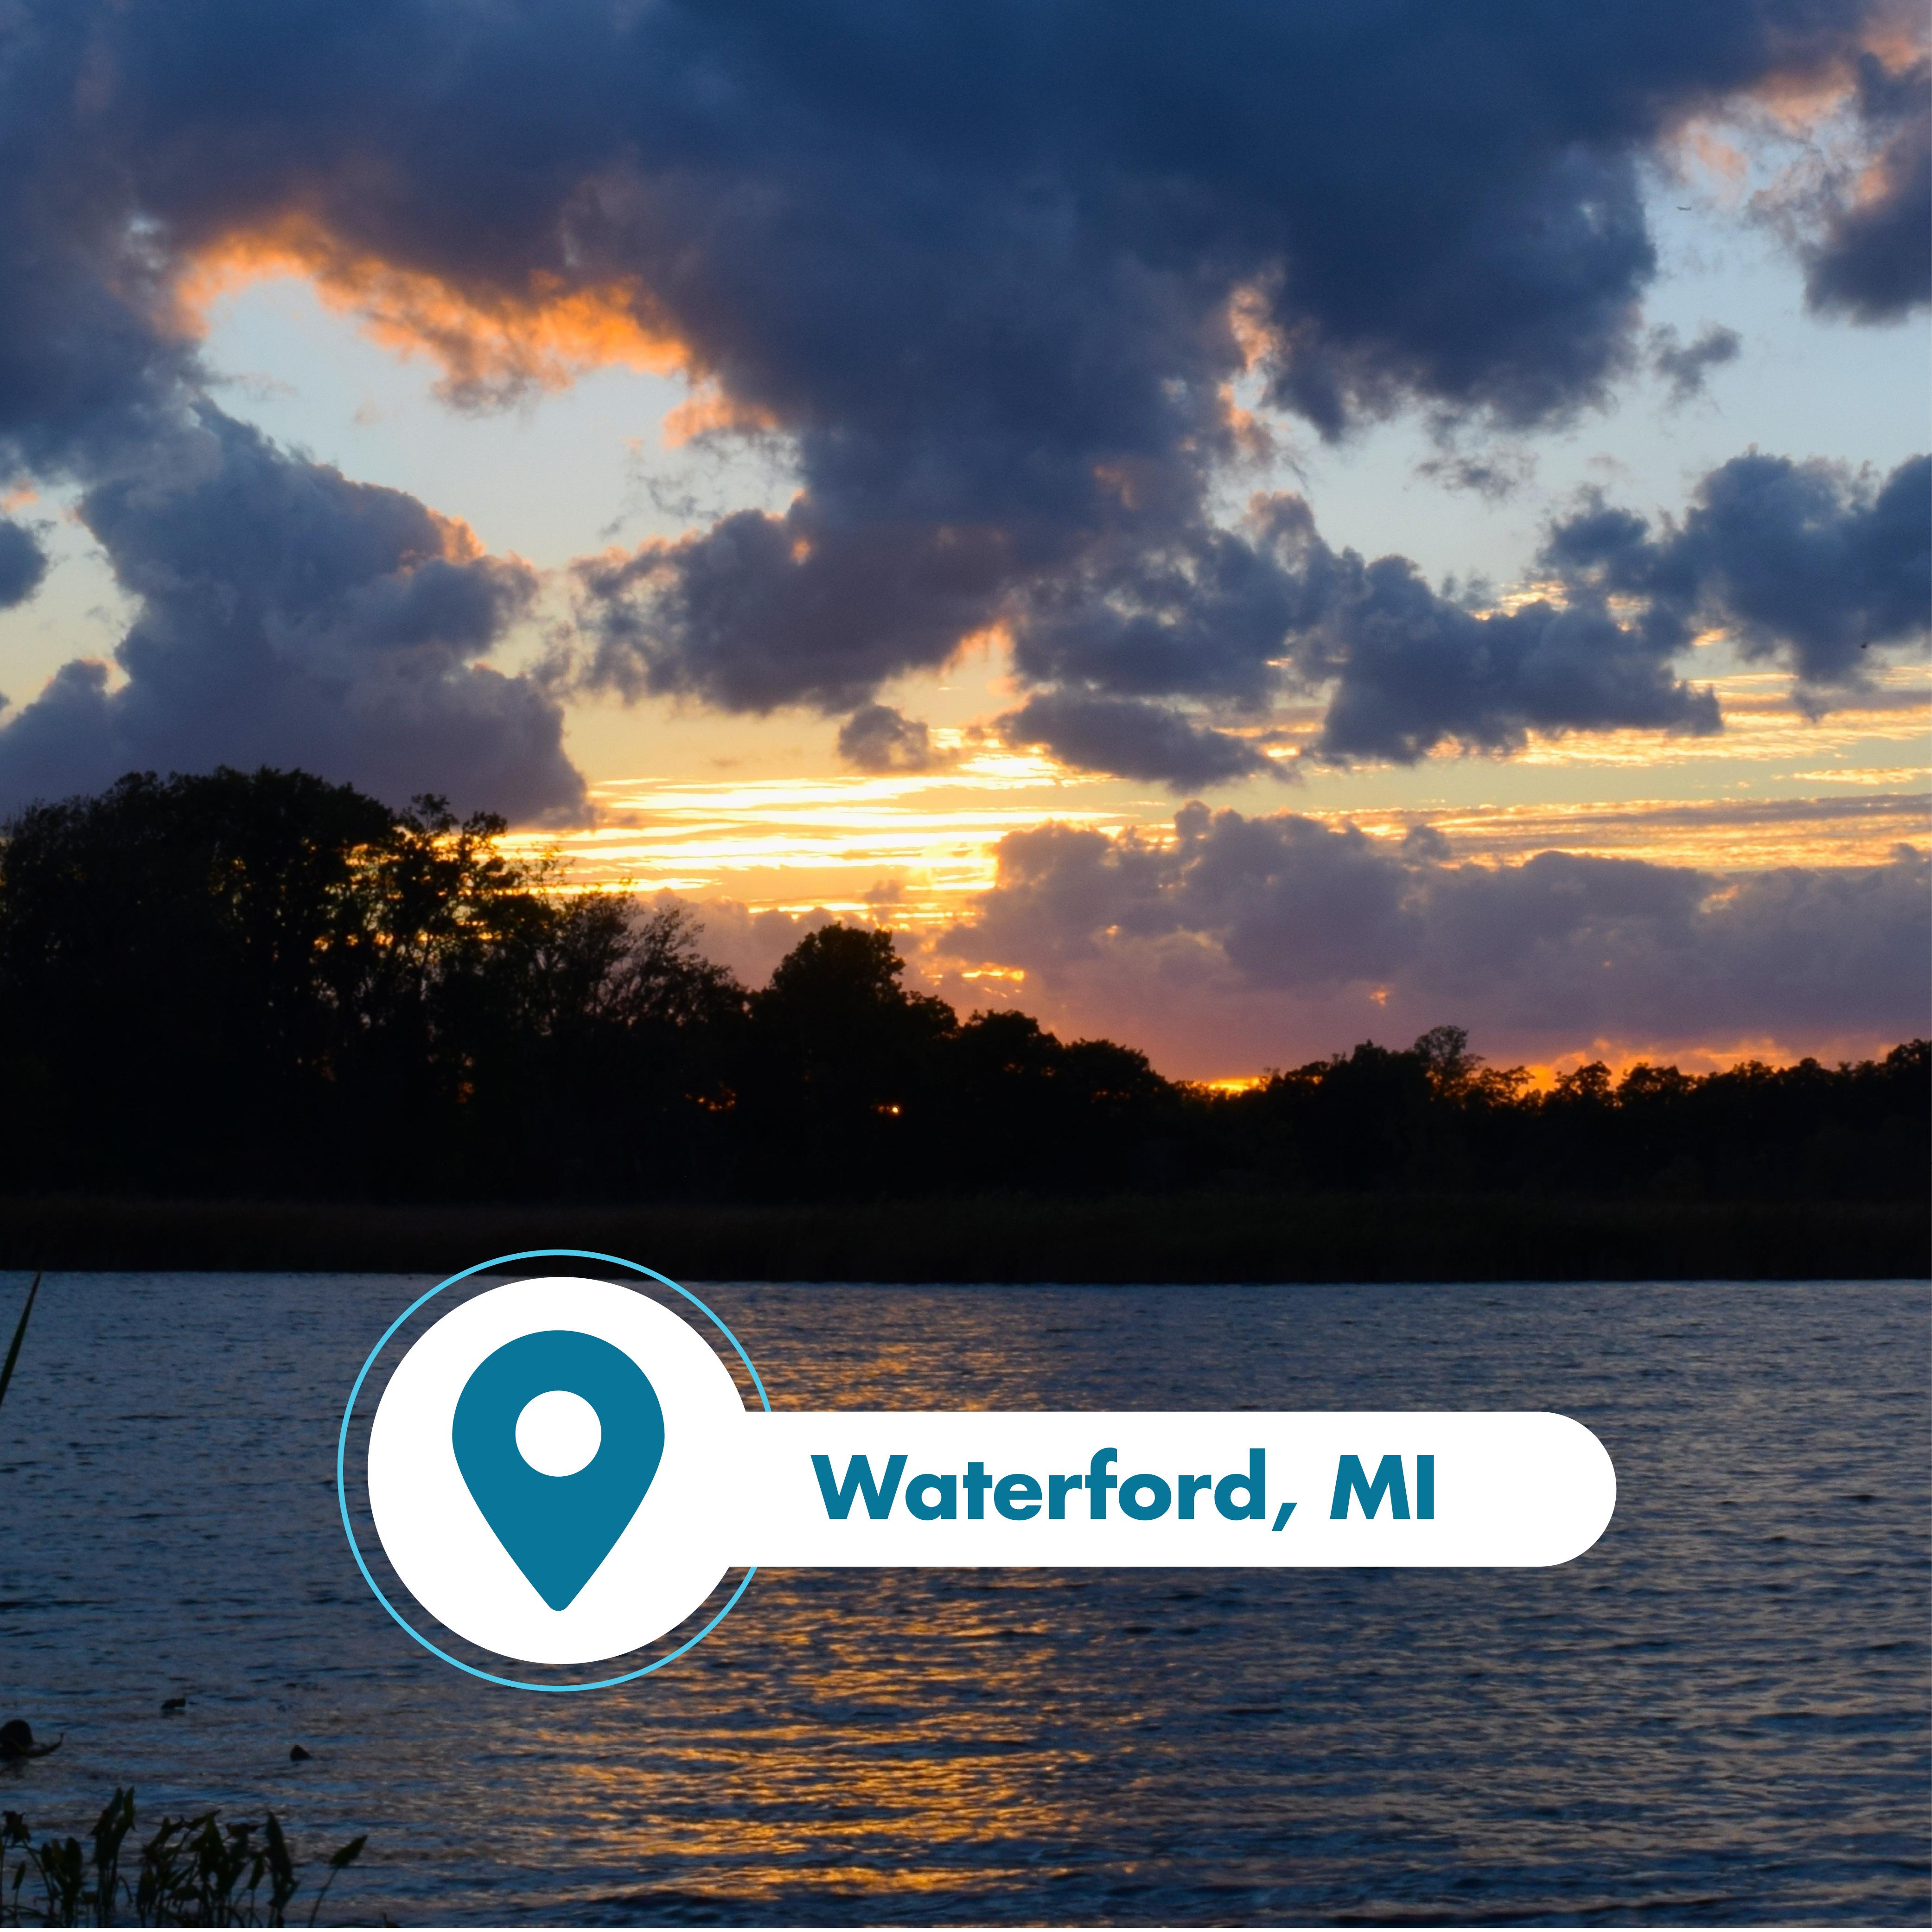 Waterford, Michigan